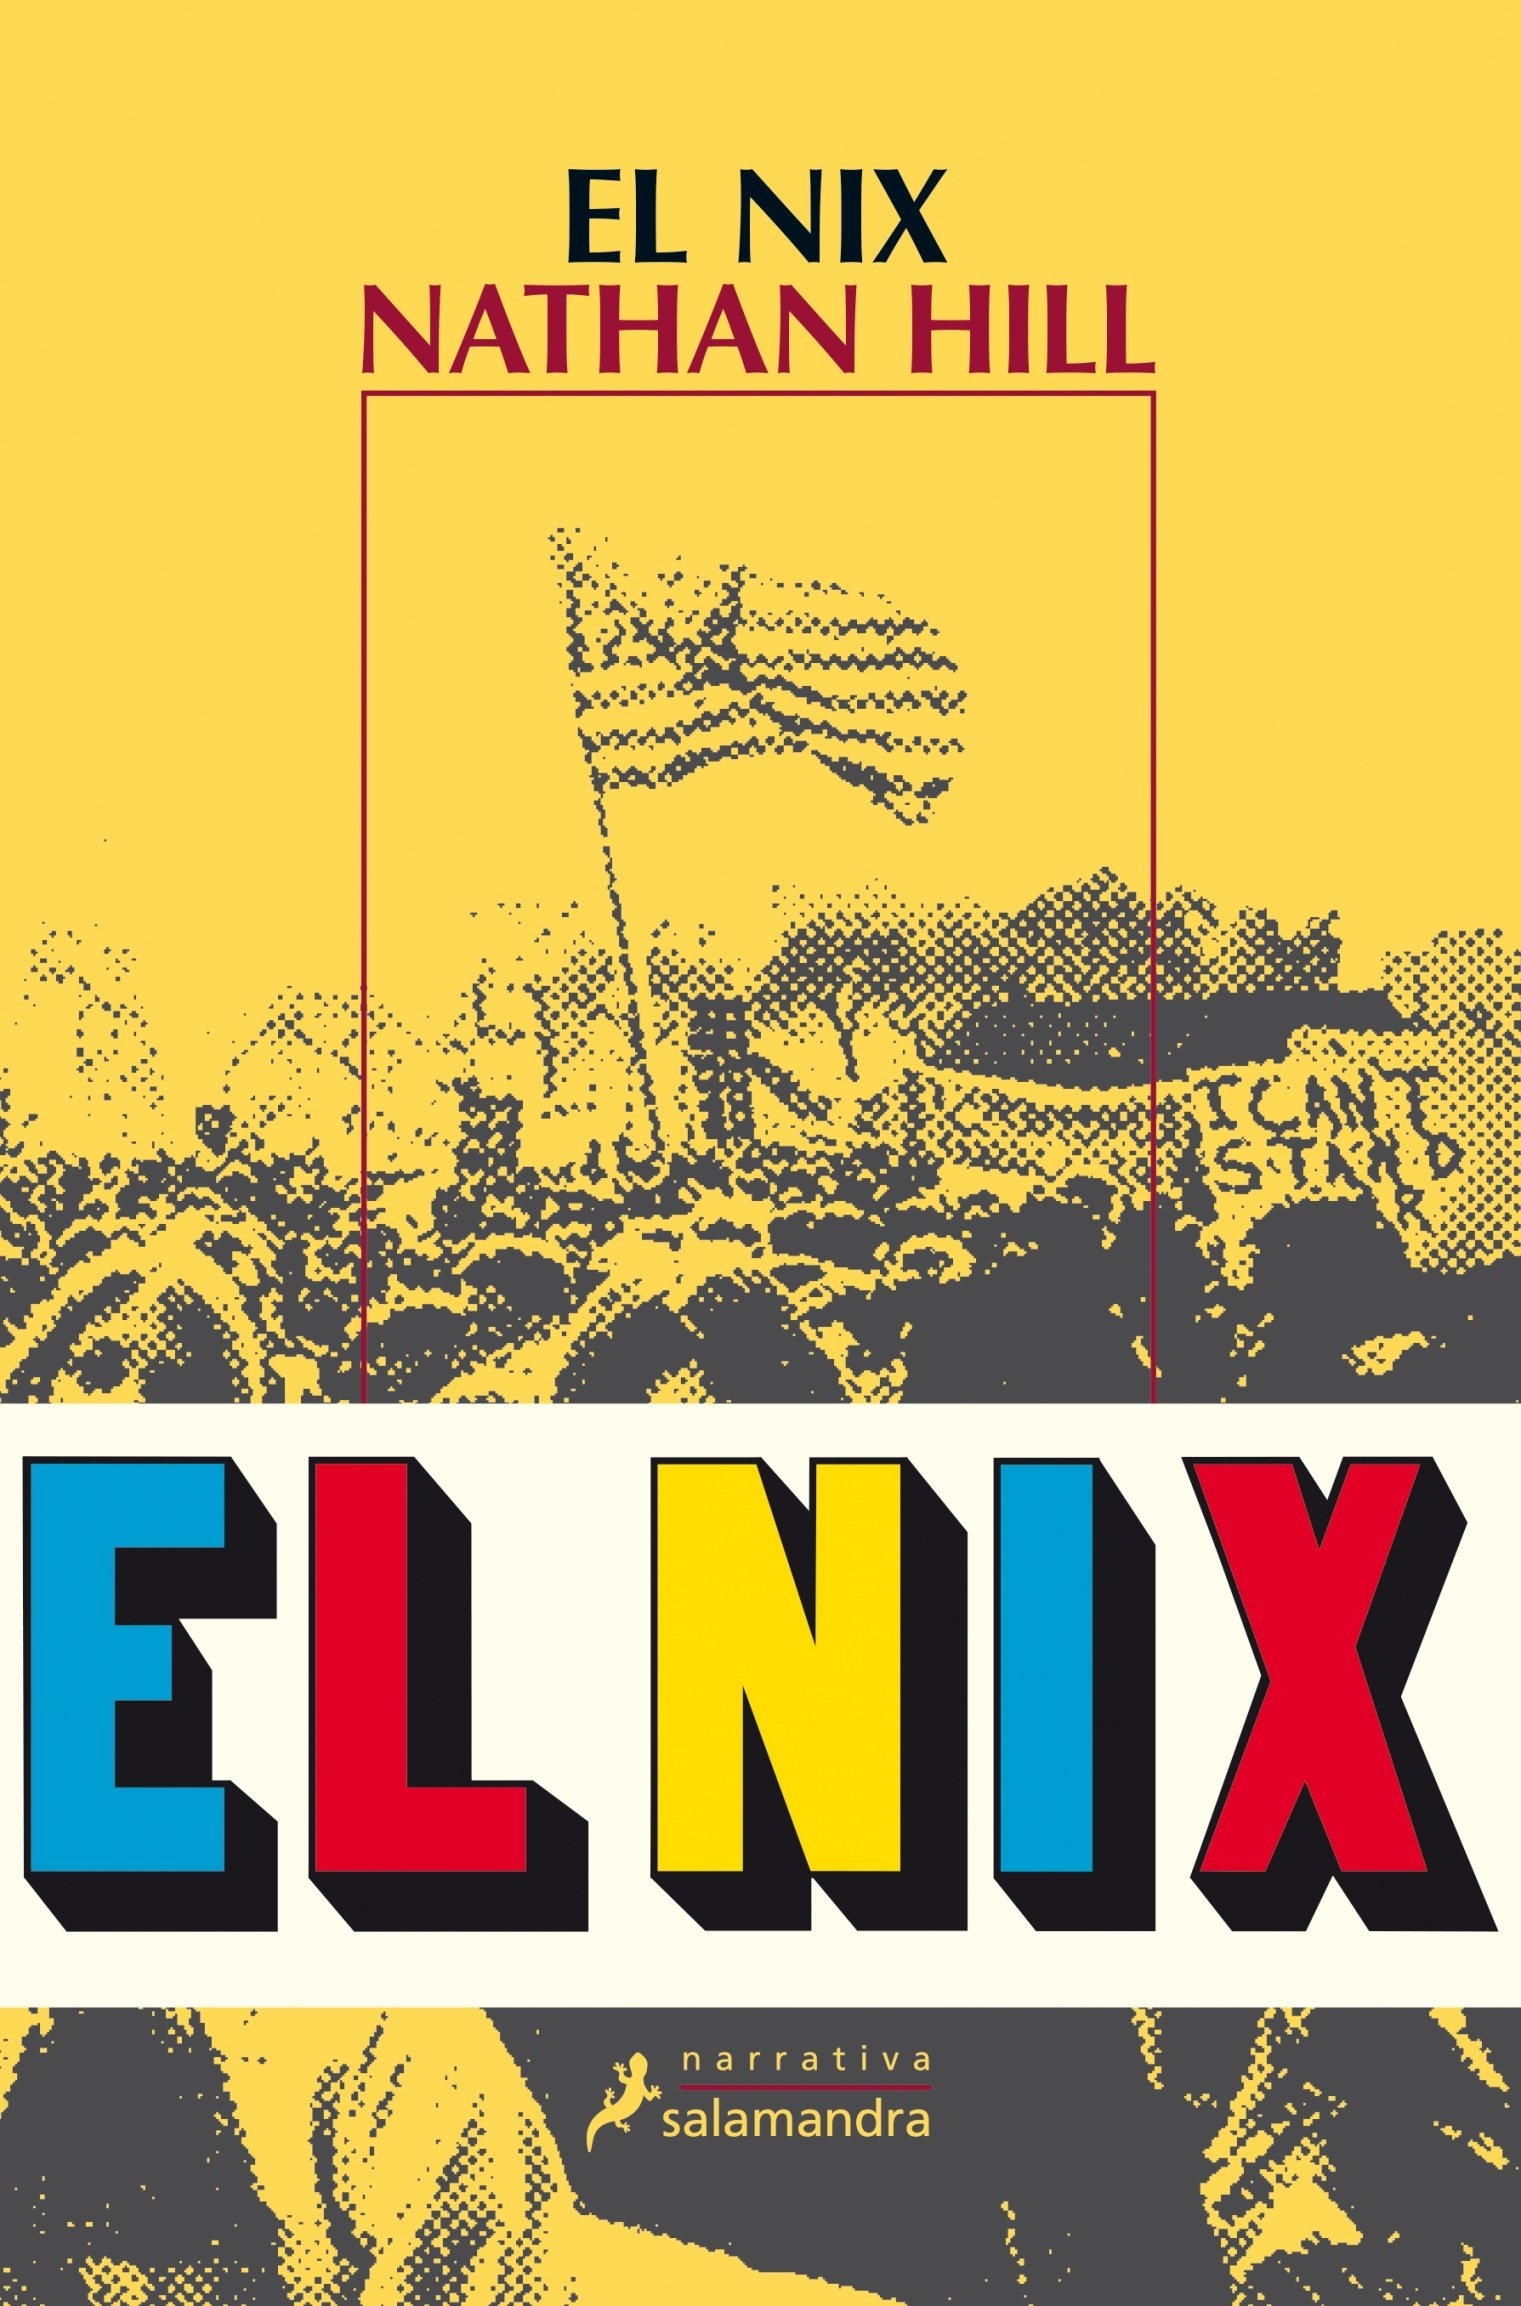 El Nix (Spanish Edition): Nathan Hill: 9788498388695: Amazon com: Books